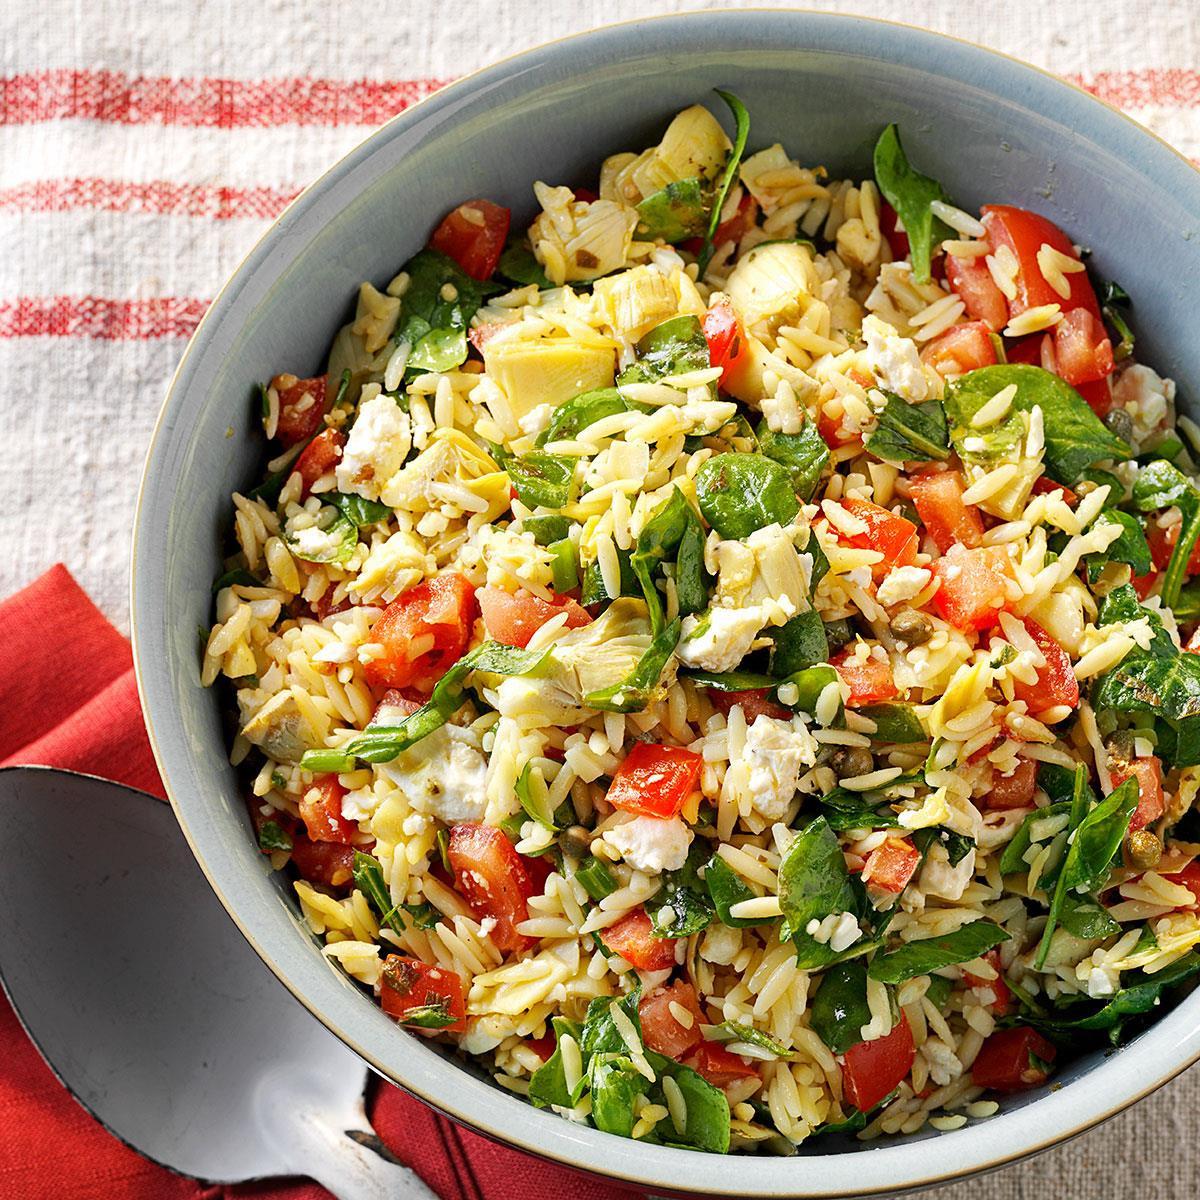 Orzo Recipes Vegetarian  Orzo Ve able Salad Recipe